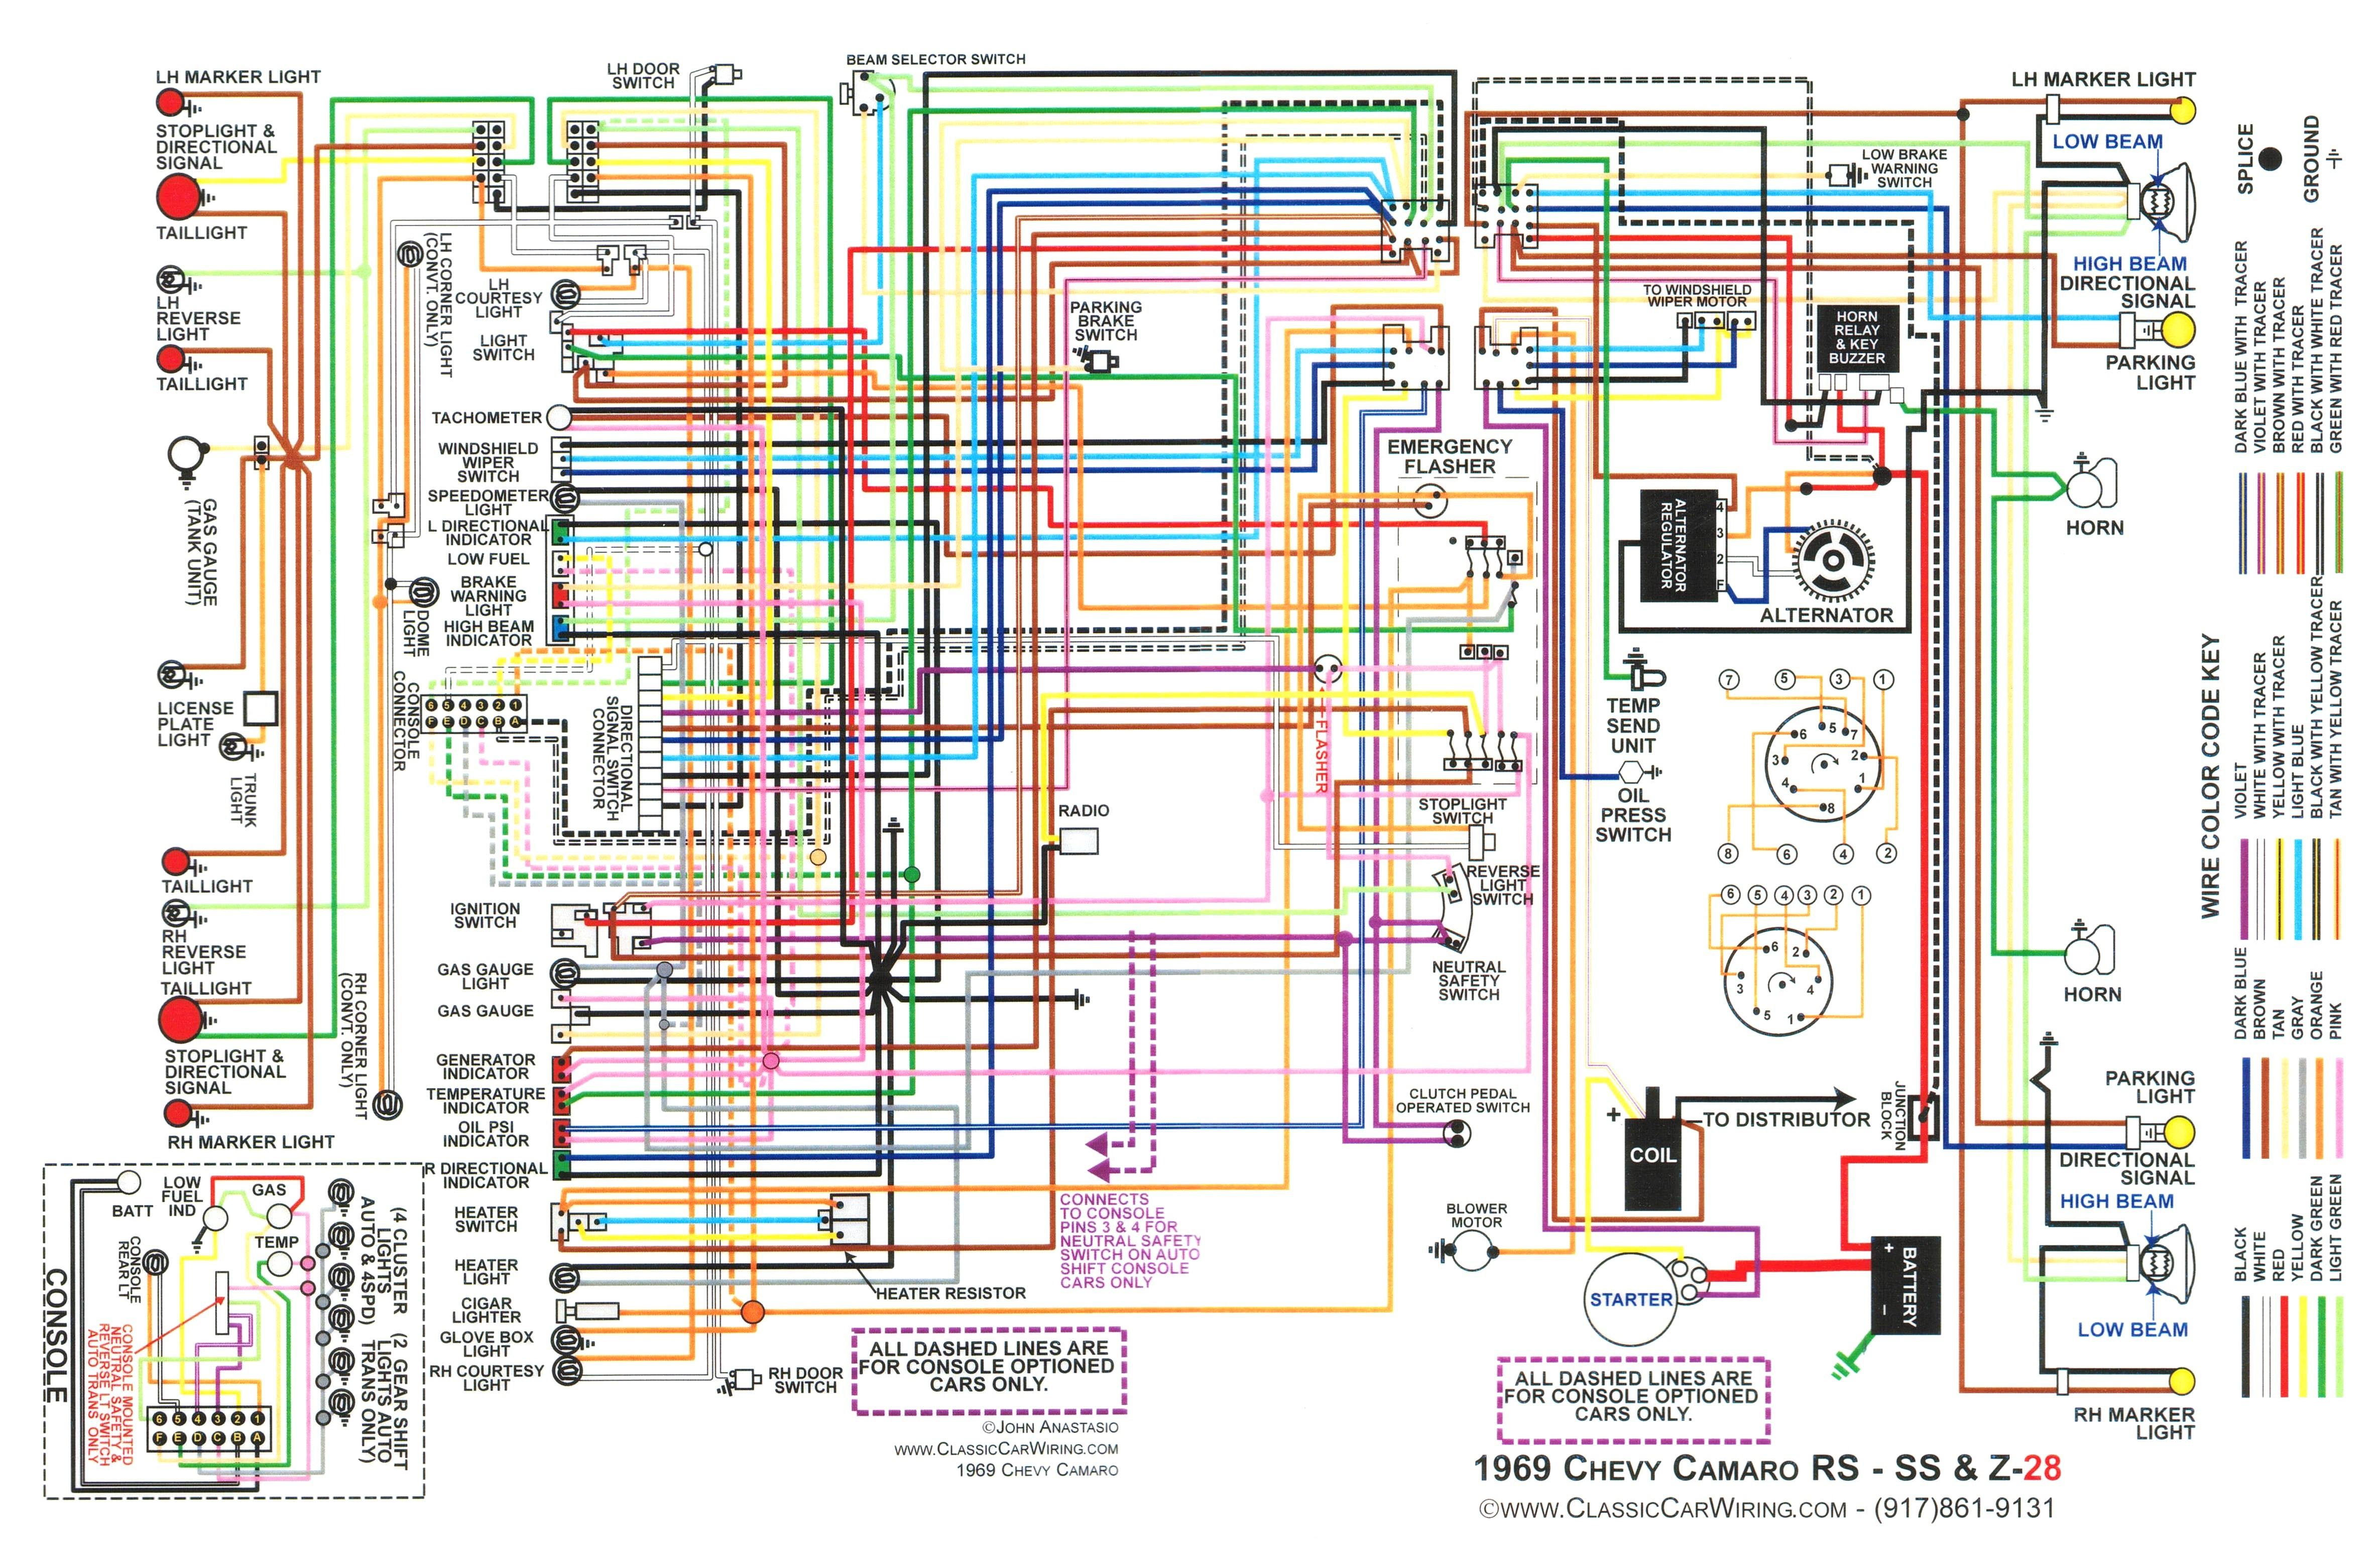 1969 camaro console wiring schematic wiring diagram dash 1978 camaro wiring diagram 1969 camaro wiring diagram printable #5